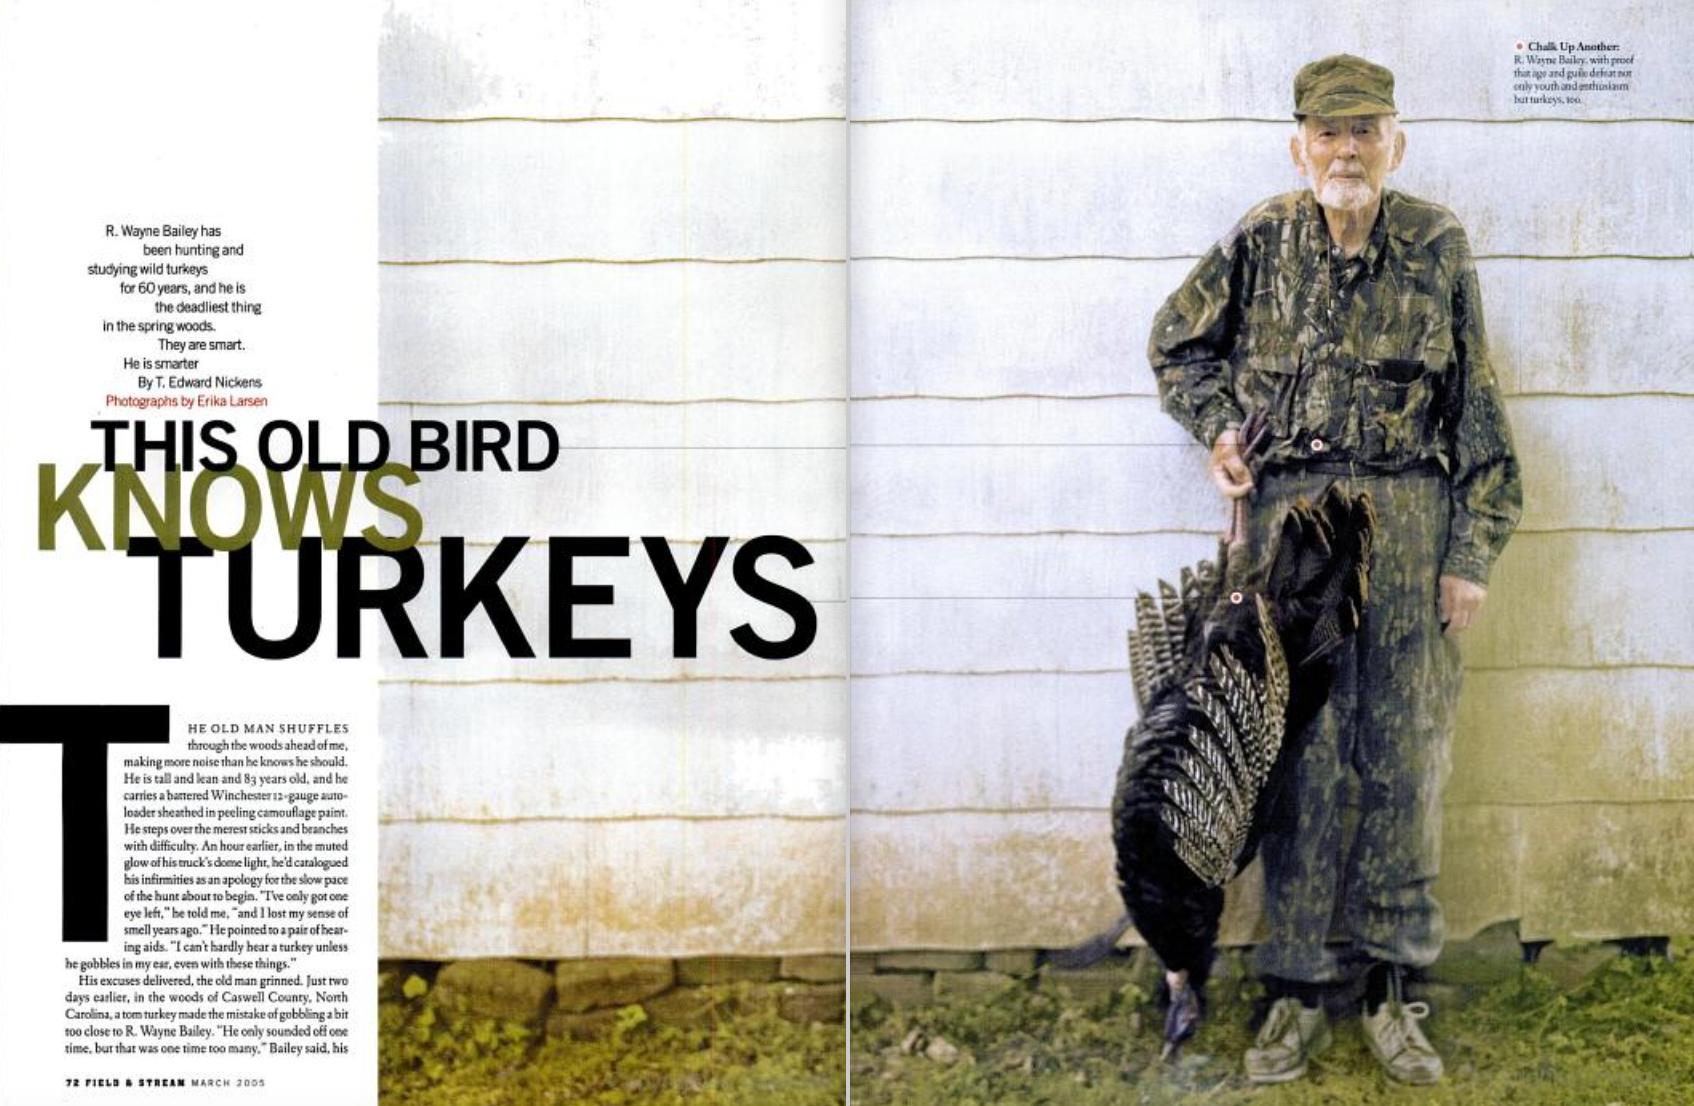 turkey hunter Wayne Bailey poses with a wild turkey.